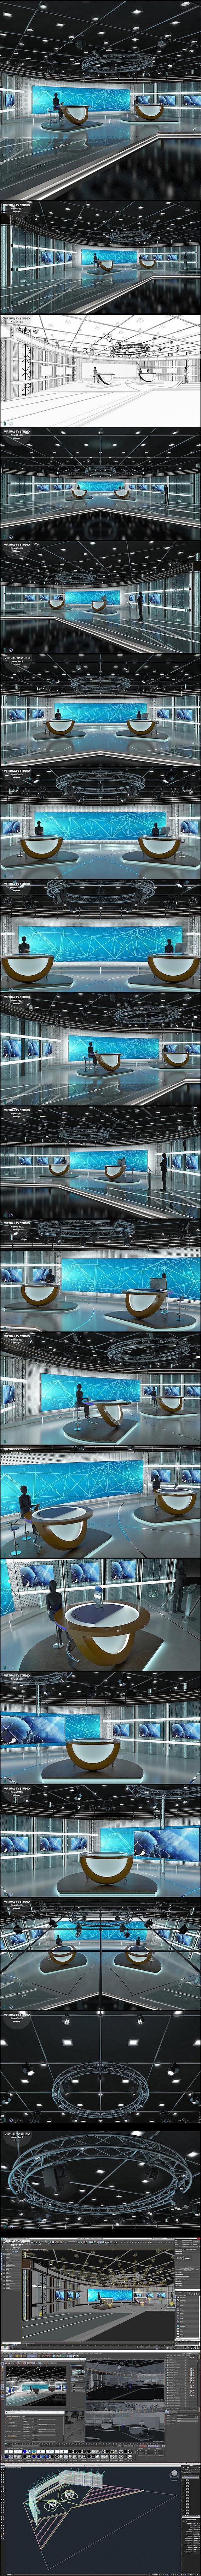 Virtual TV Studio News Set 3 - 3D Model Designs